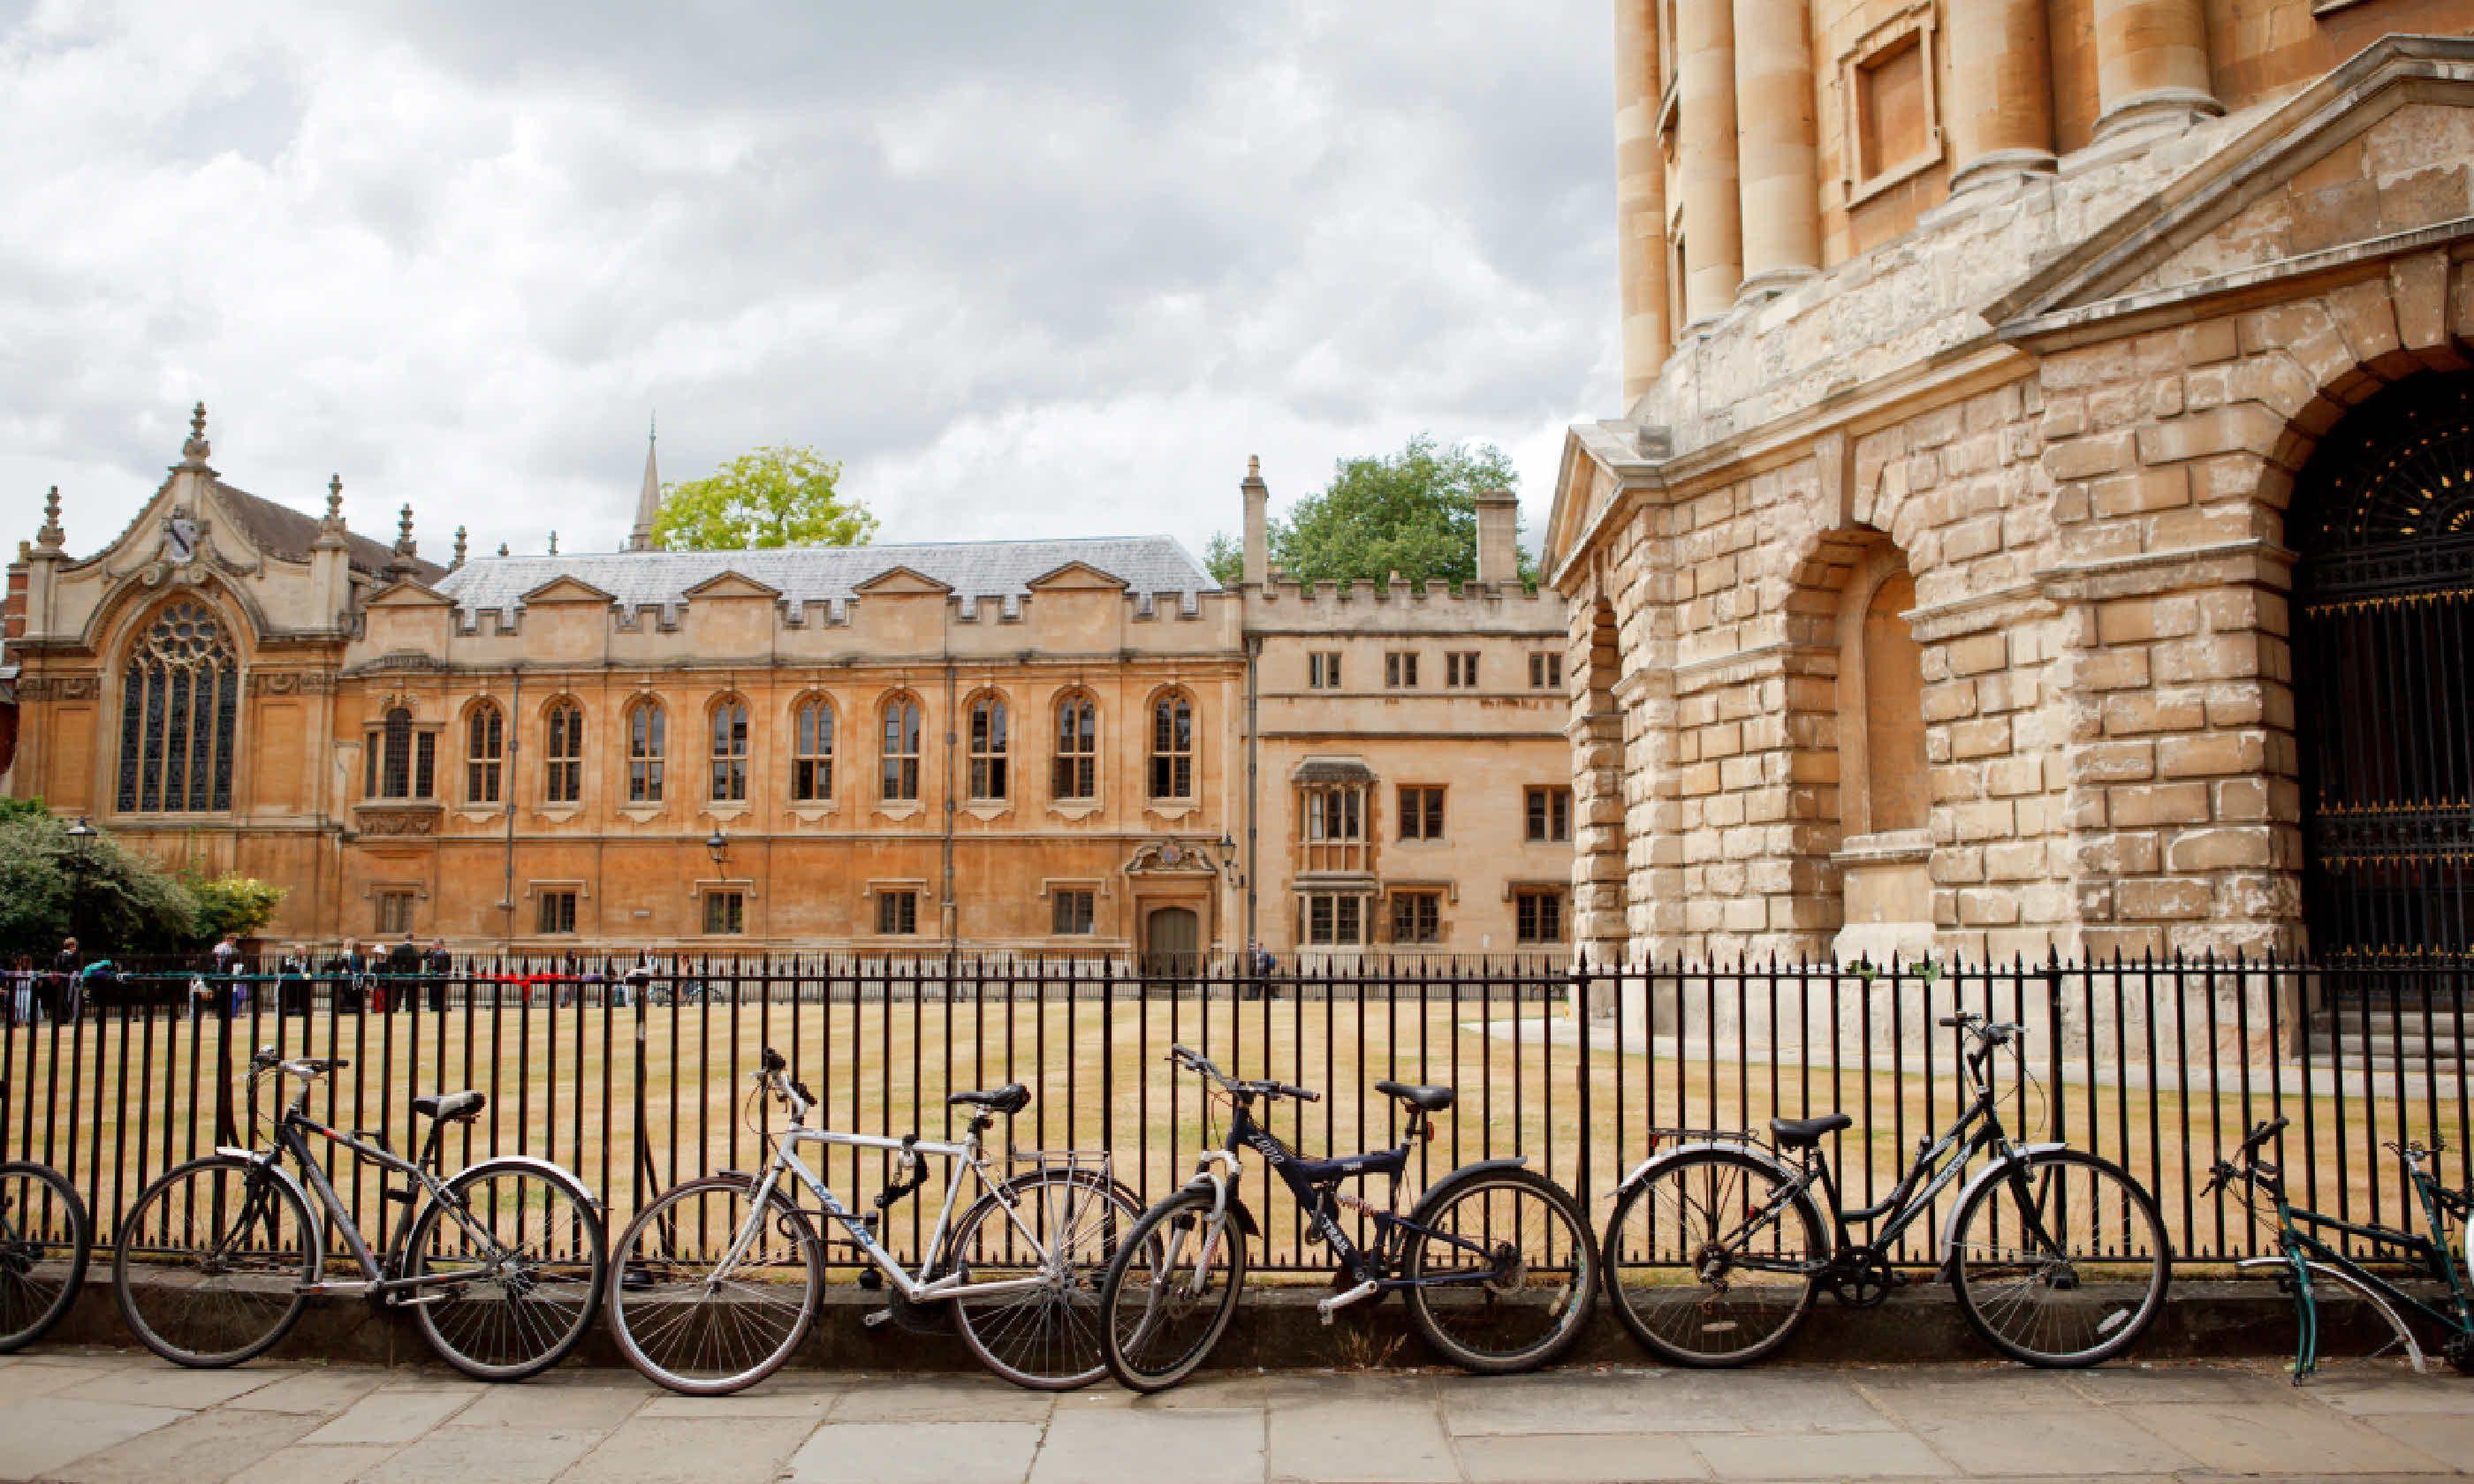 Oxford University, England (Shutterstock)